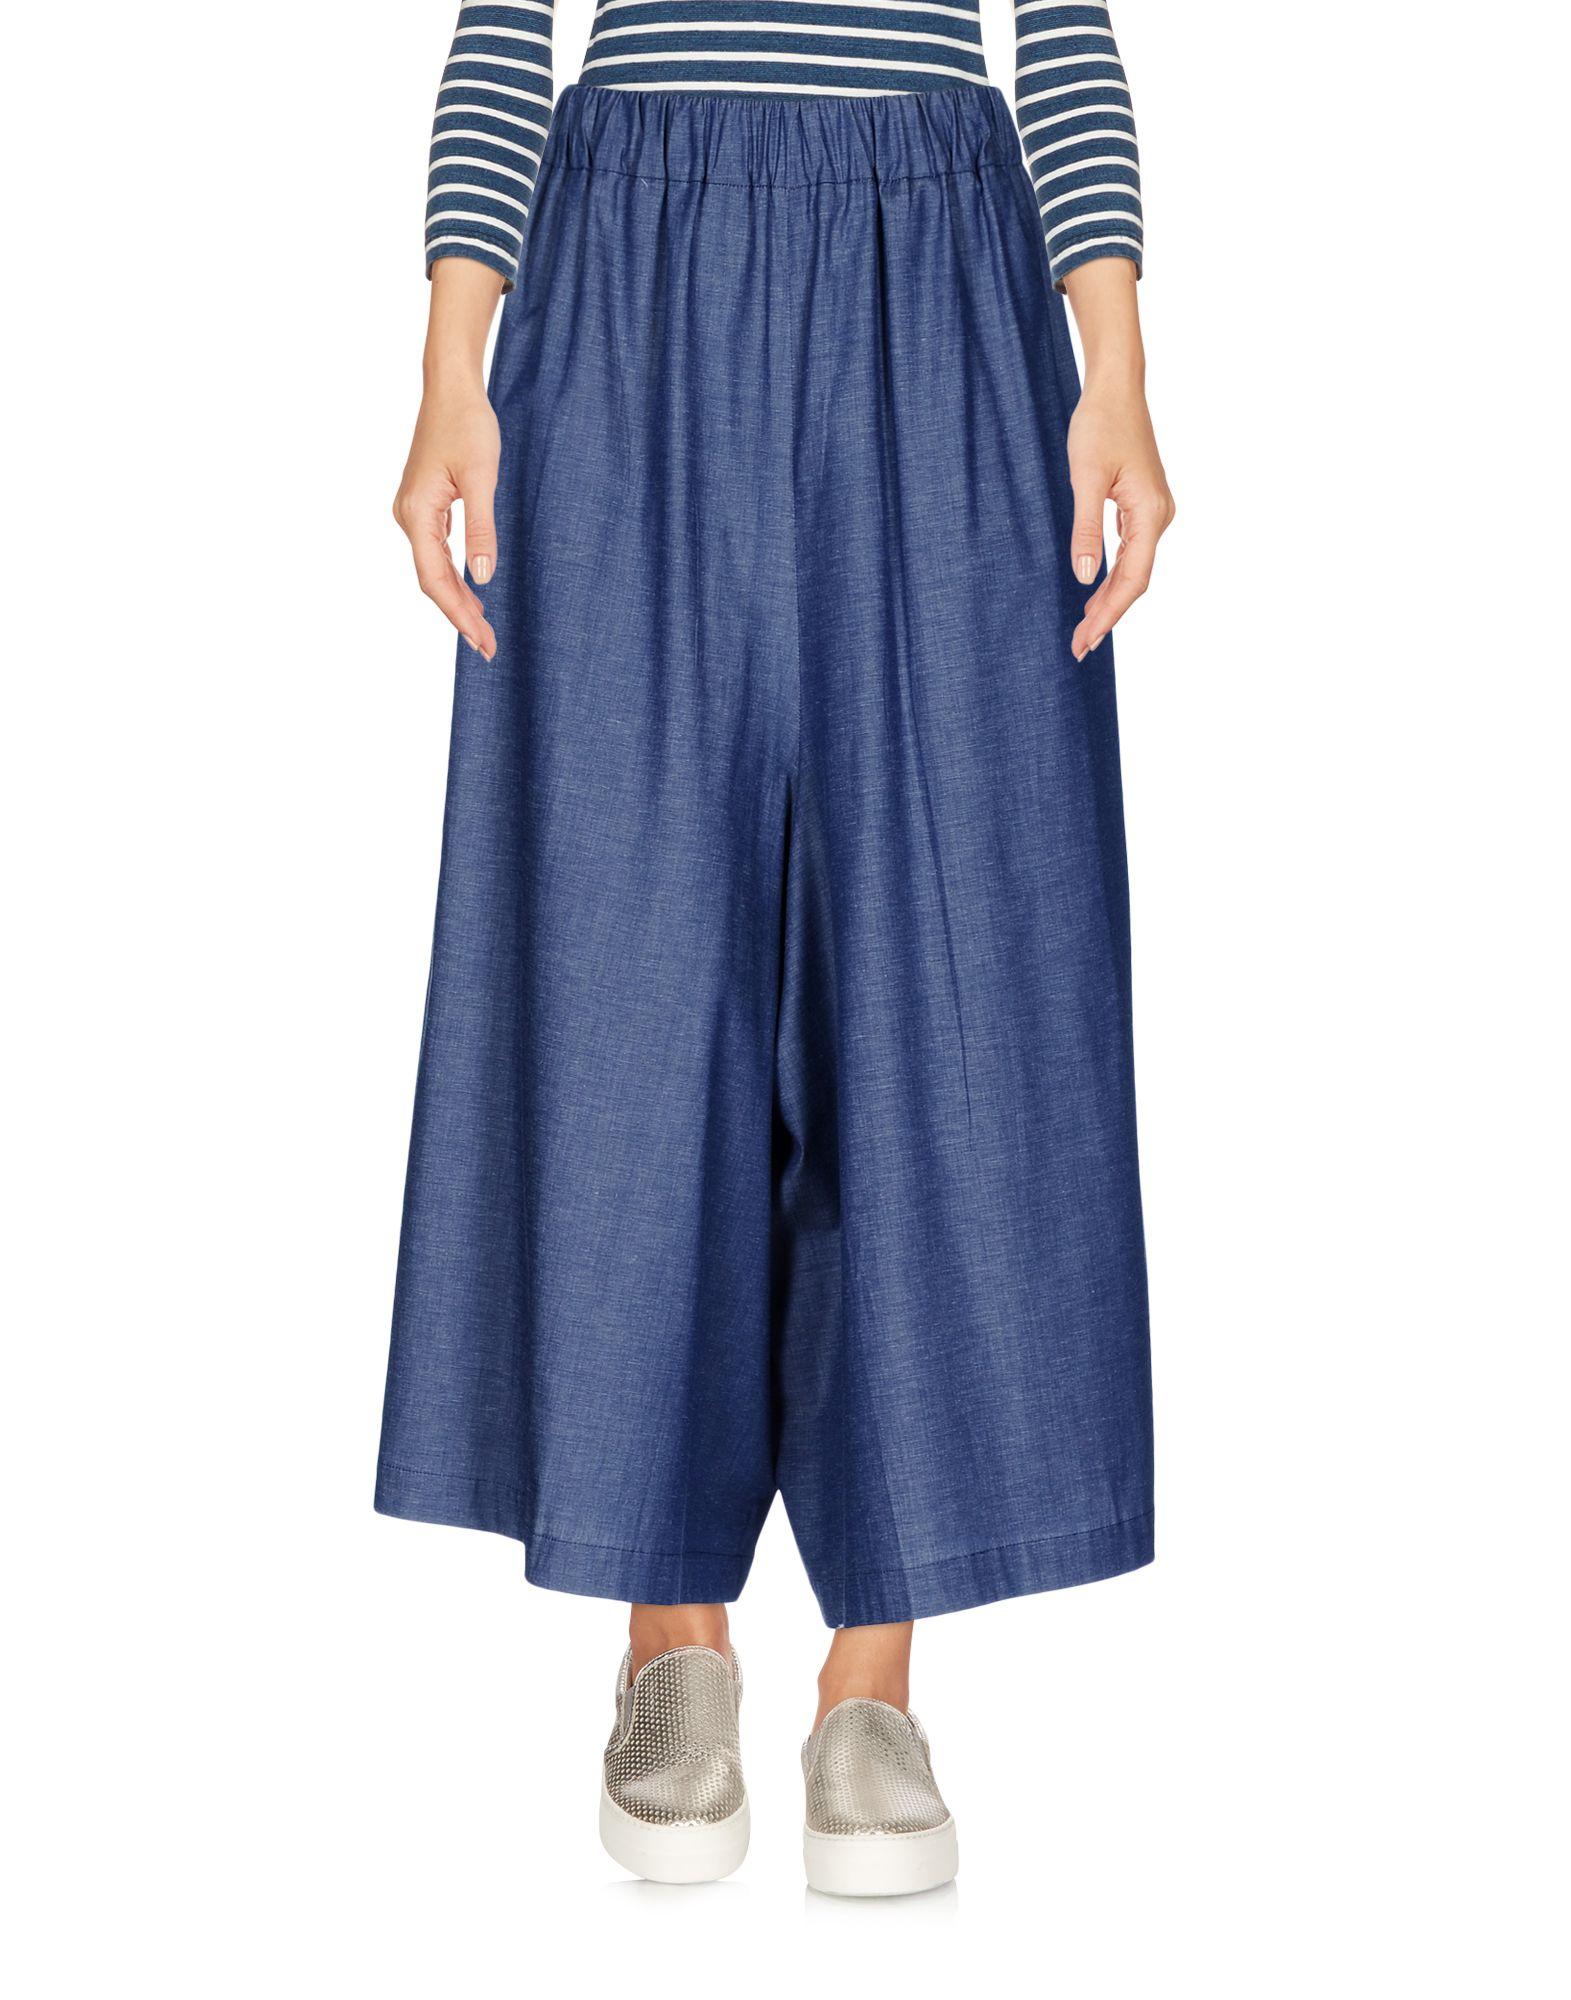 ROSE' A POIS Джинсовая юбка topshop джинсовая юбка